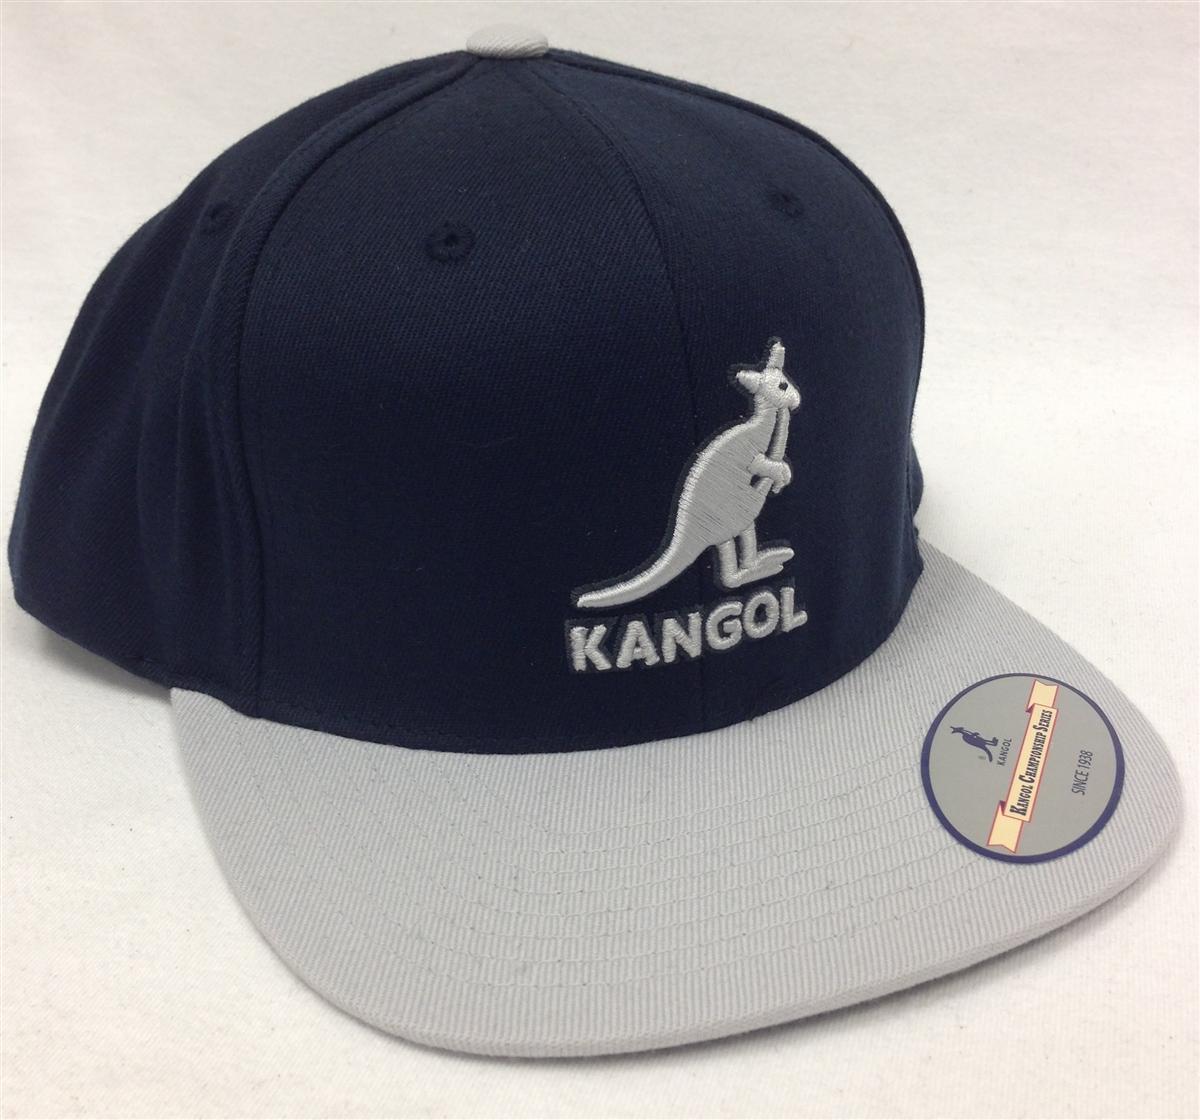 Kangol Championship Links Navy   Gray Snapback e3fedcb0274d